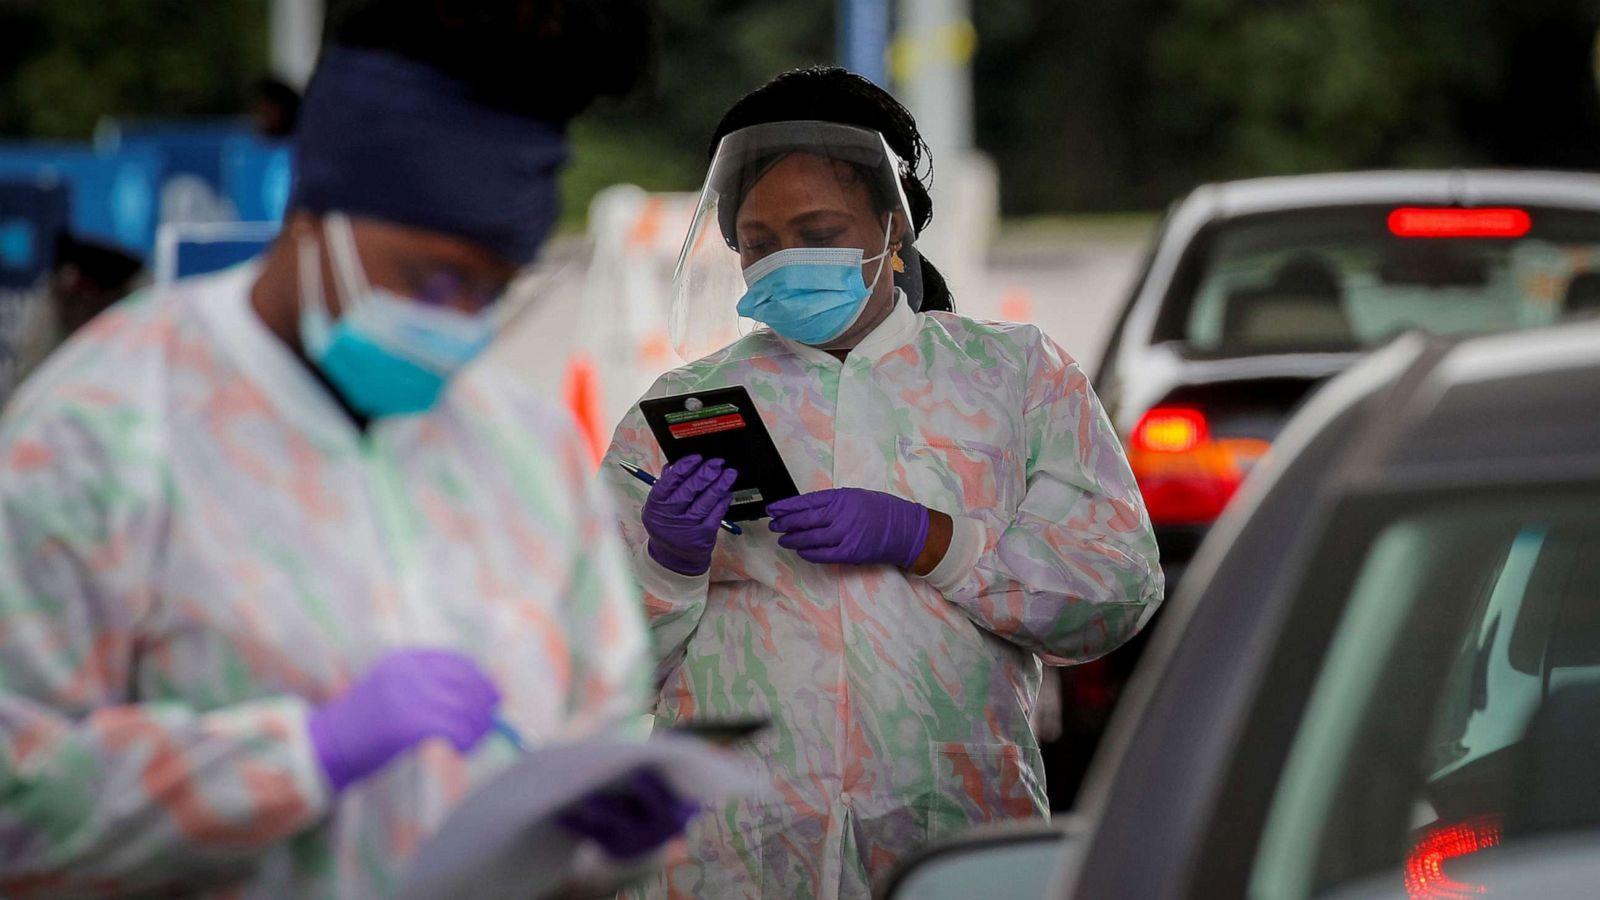 Coronavirus live updates: US caseload edges closer to 7 million